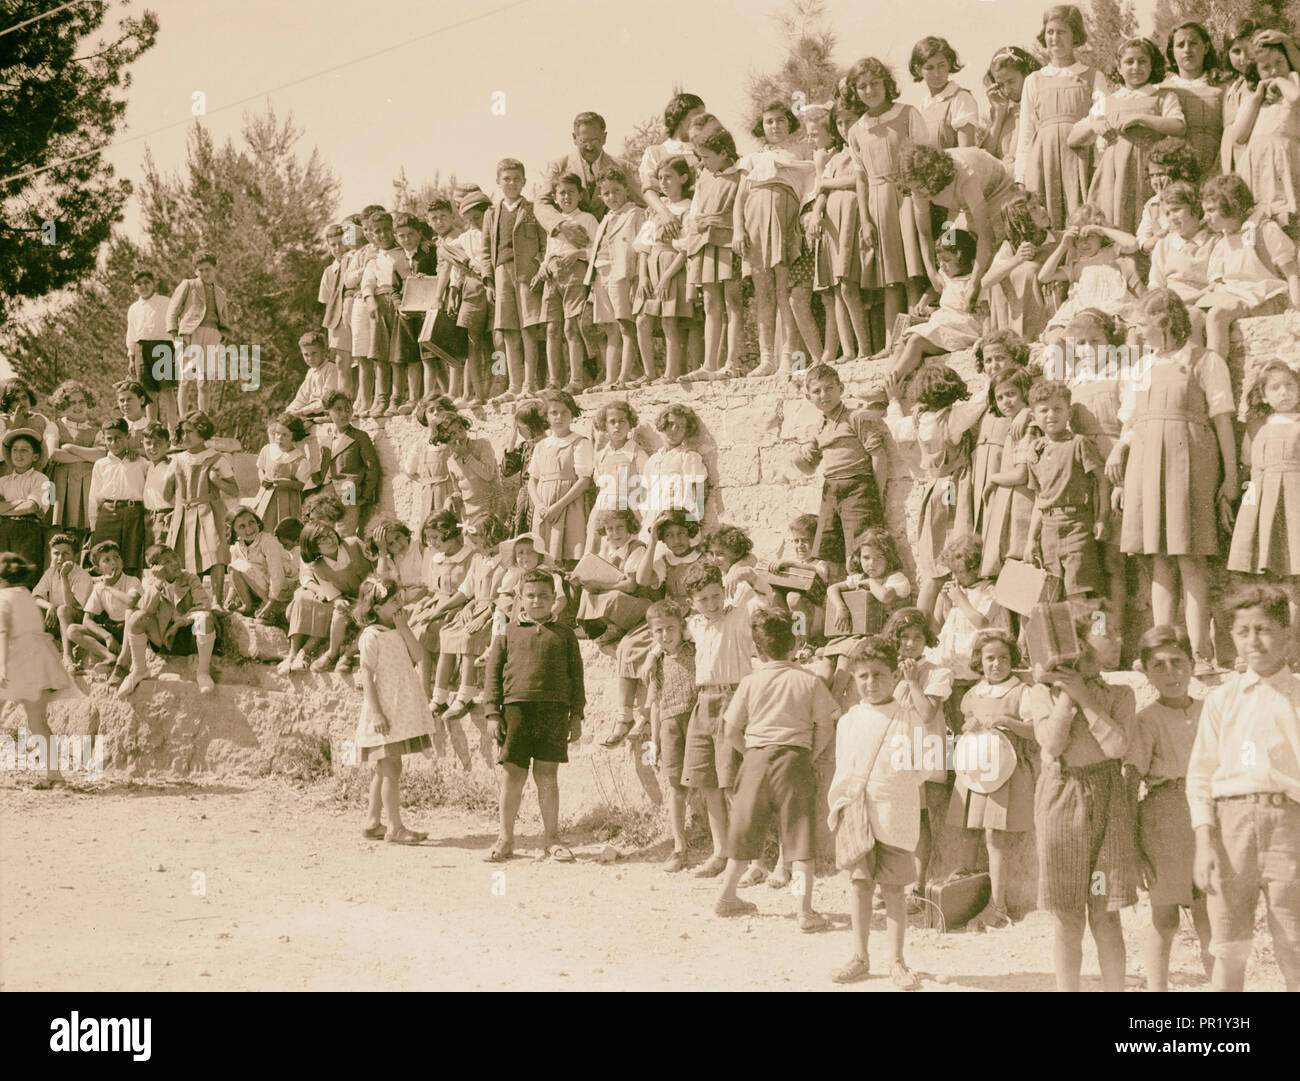 Ramallah Quaker Mission School, photographed in 1937. 1937, West Bank, Rām Allāh - Stock Image